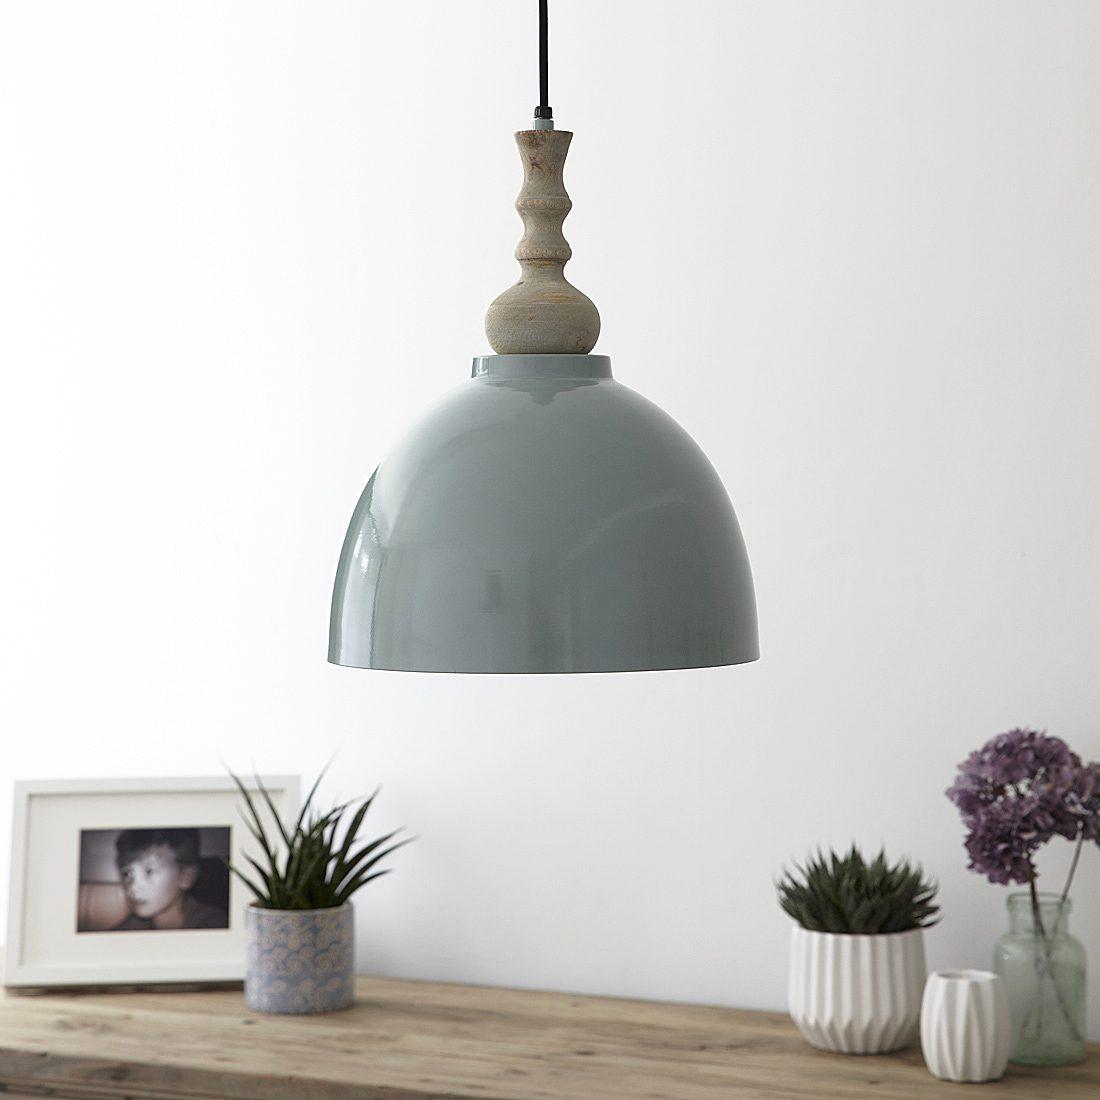 retro metal garden chairs chair bed uk duck egg pendant light with wooden top – primrose & plum